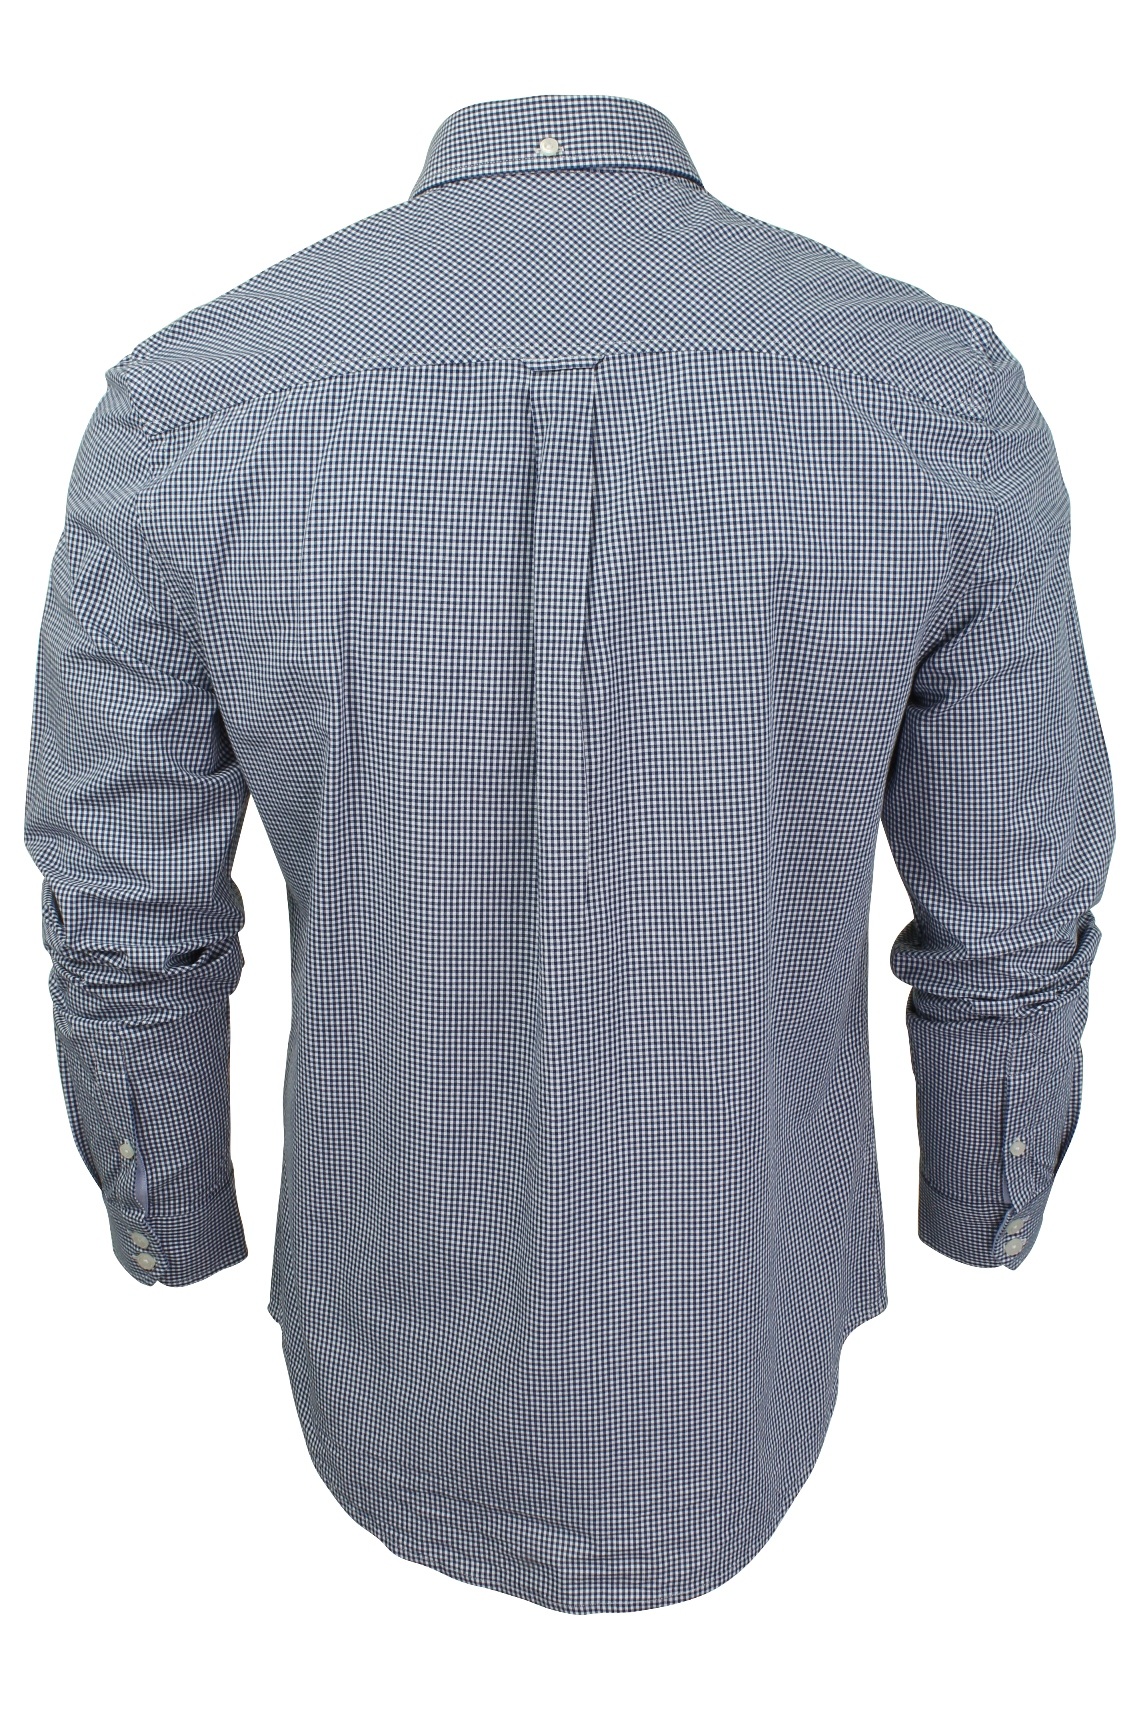 Mens-Classic-Gingham-Shirt-by-Ben-Sherman-Long-Sleeved thumbnail 5